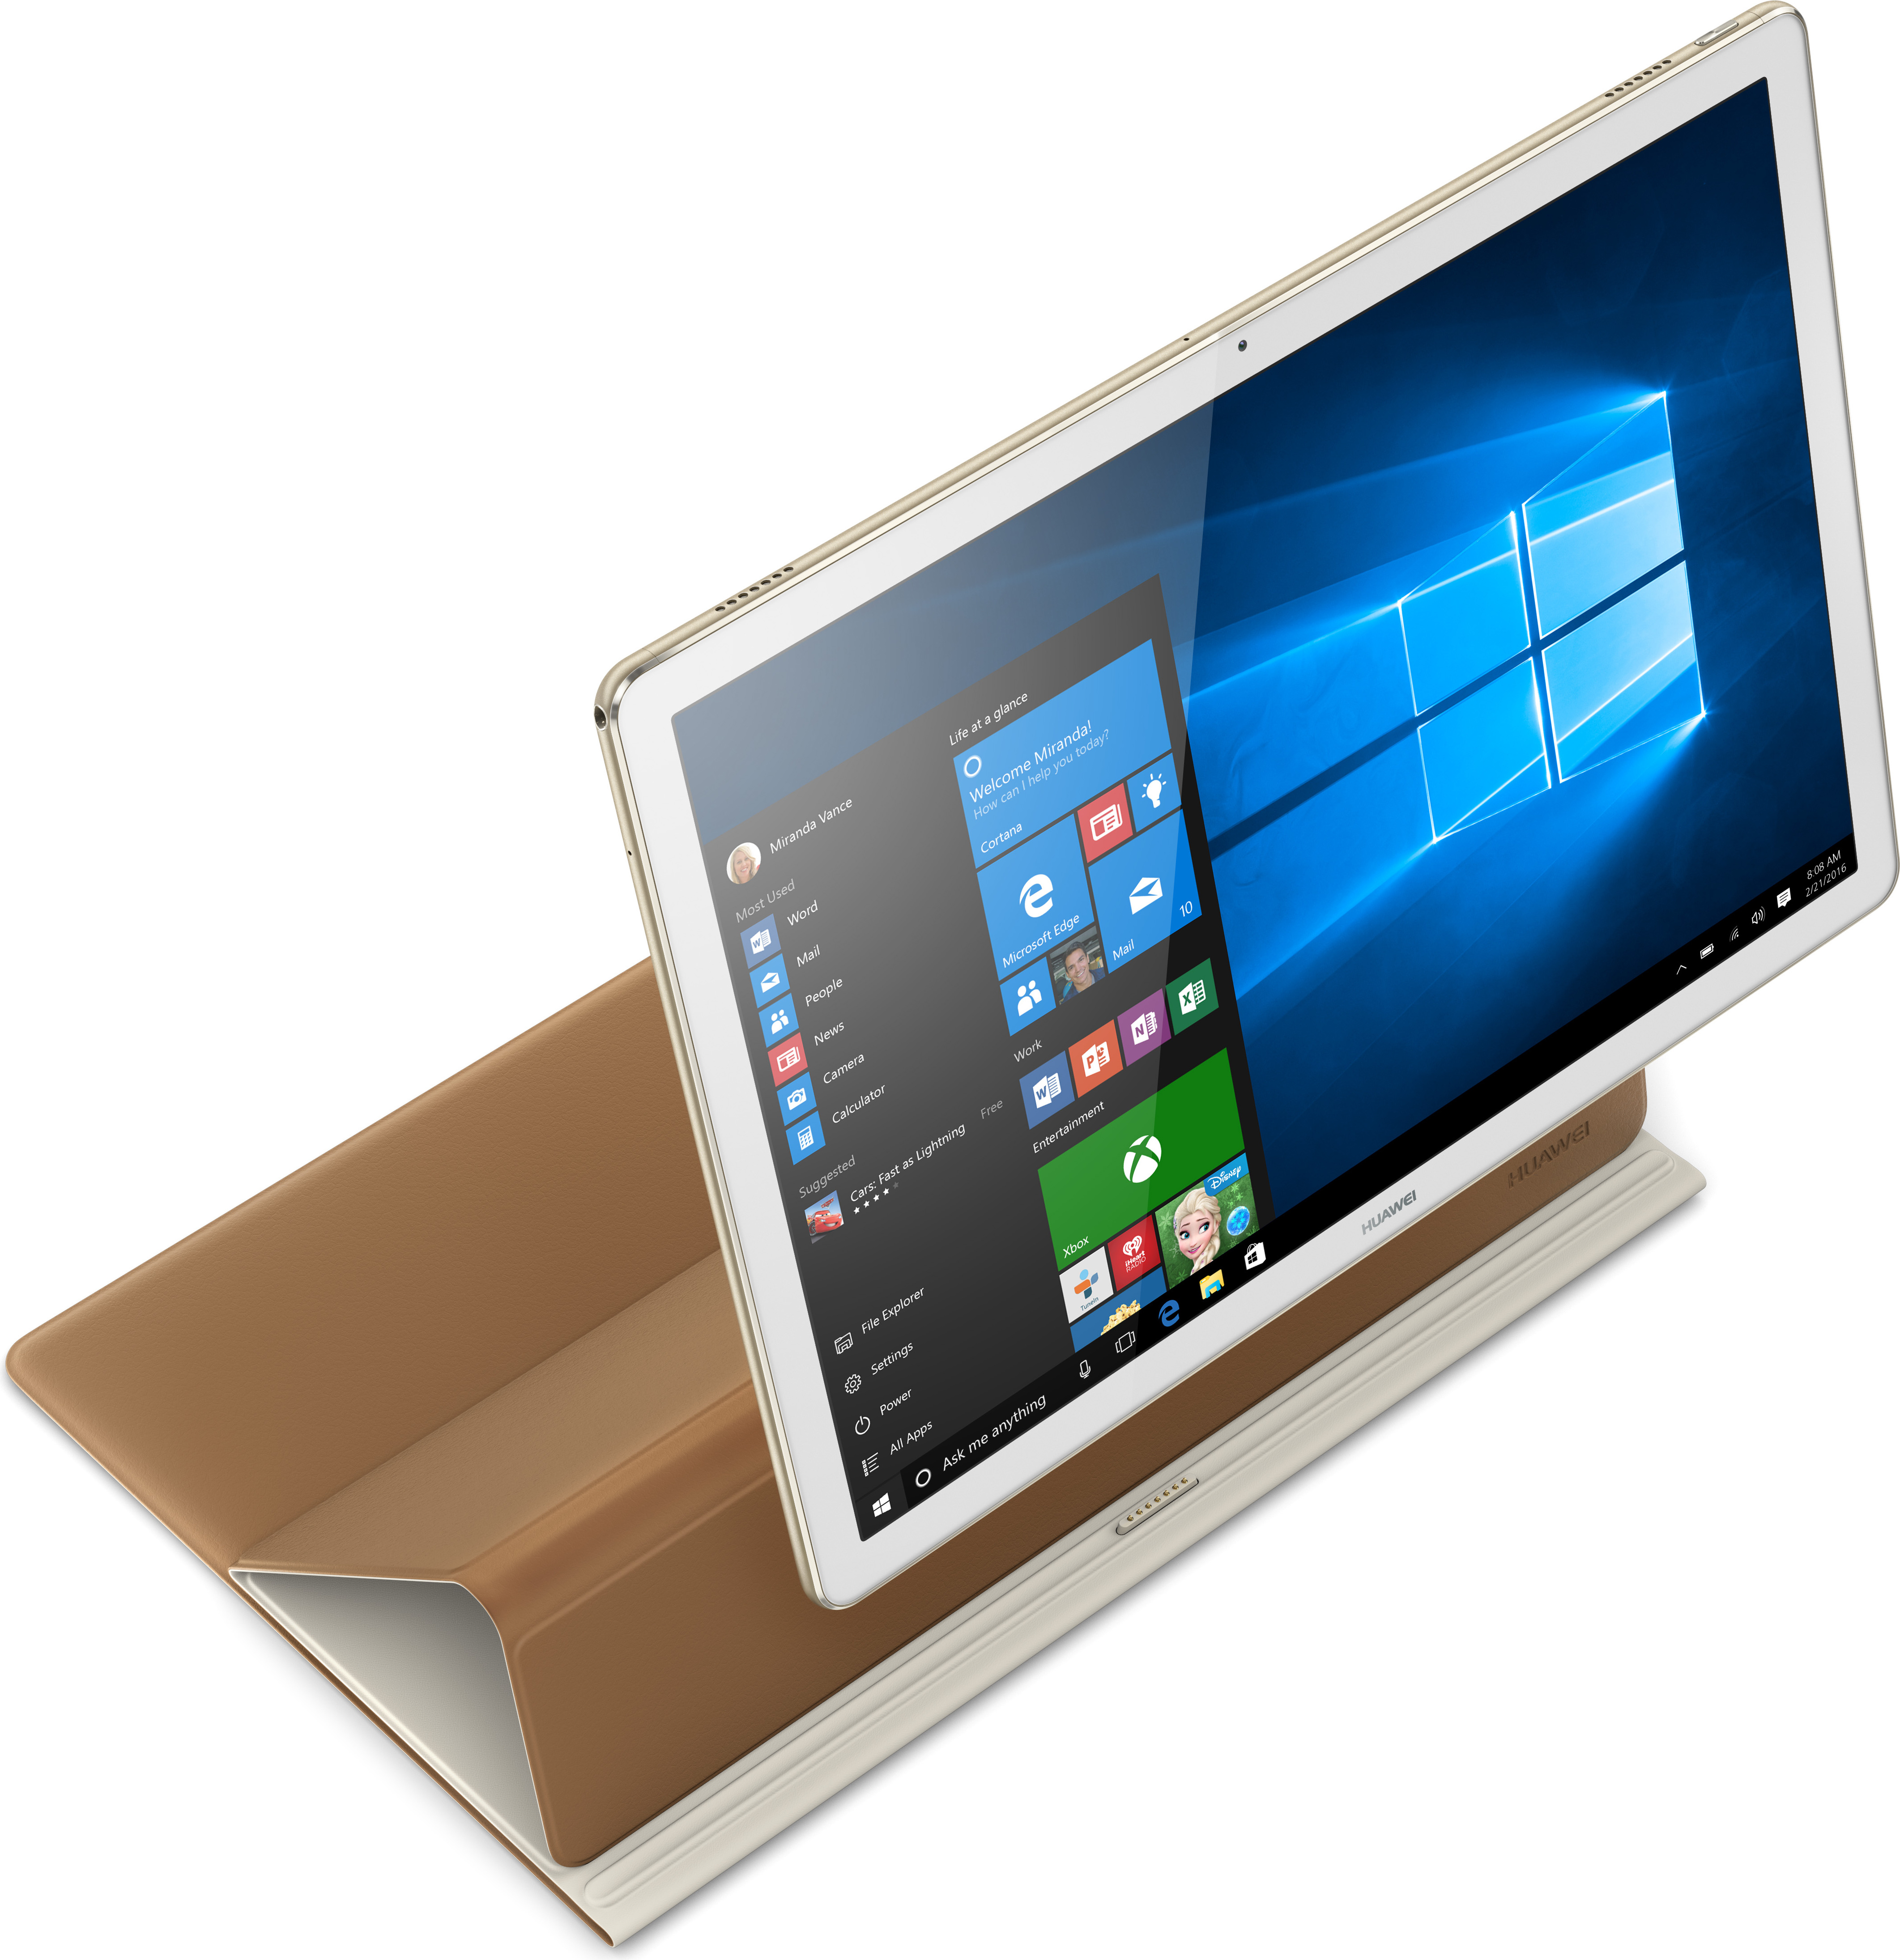 huawei matebook mi ordinateur portable mi smartphone. Black Bedroom Furniture Sets. Home Design Ideas